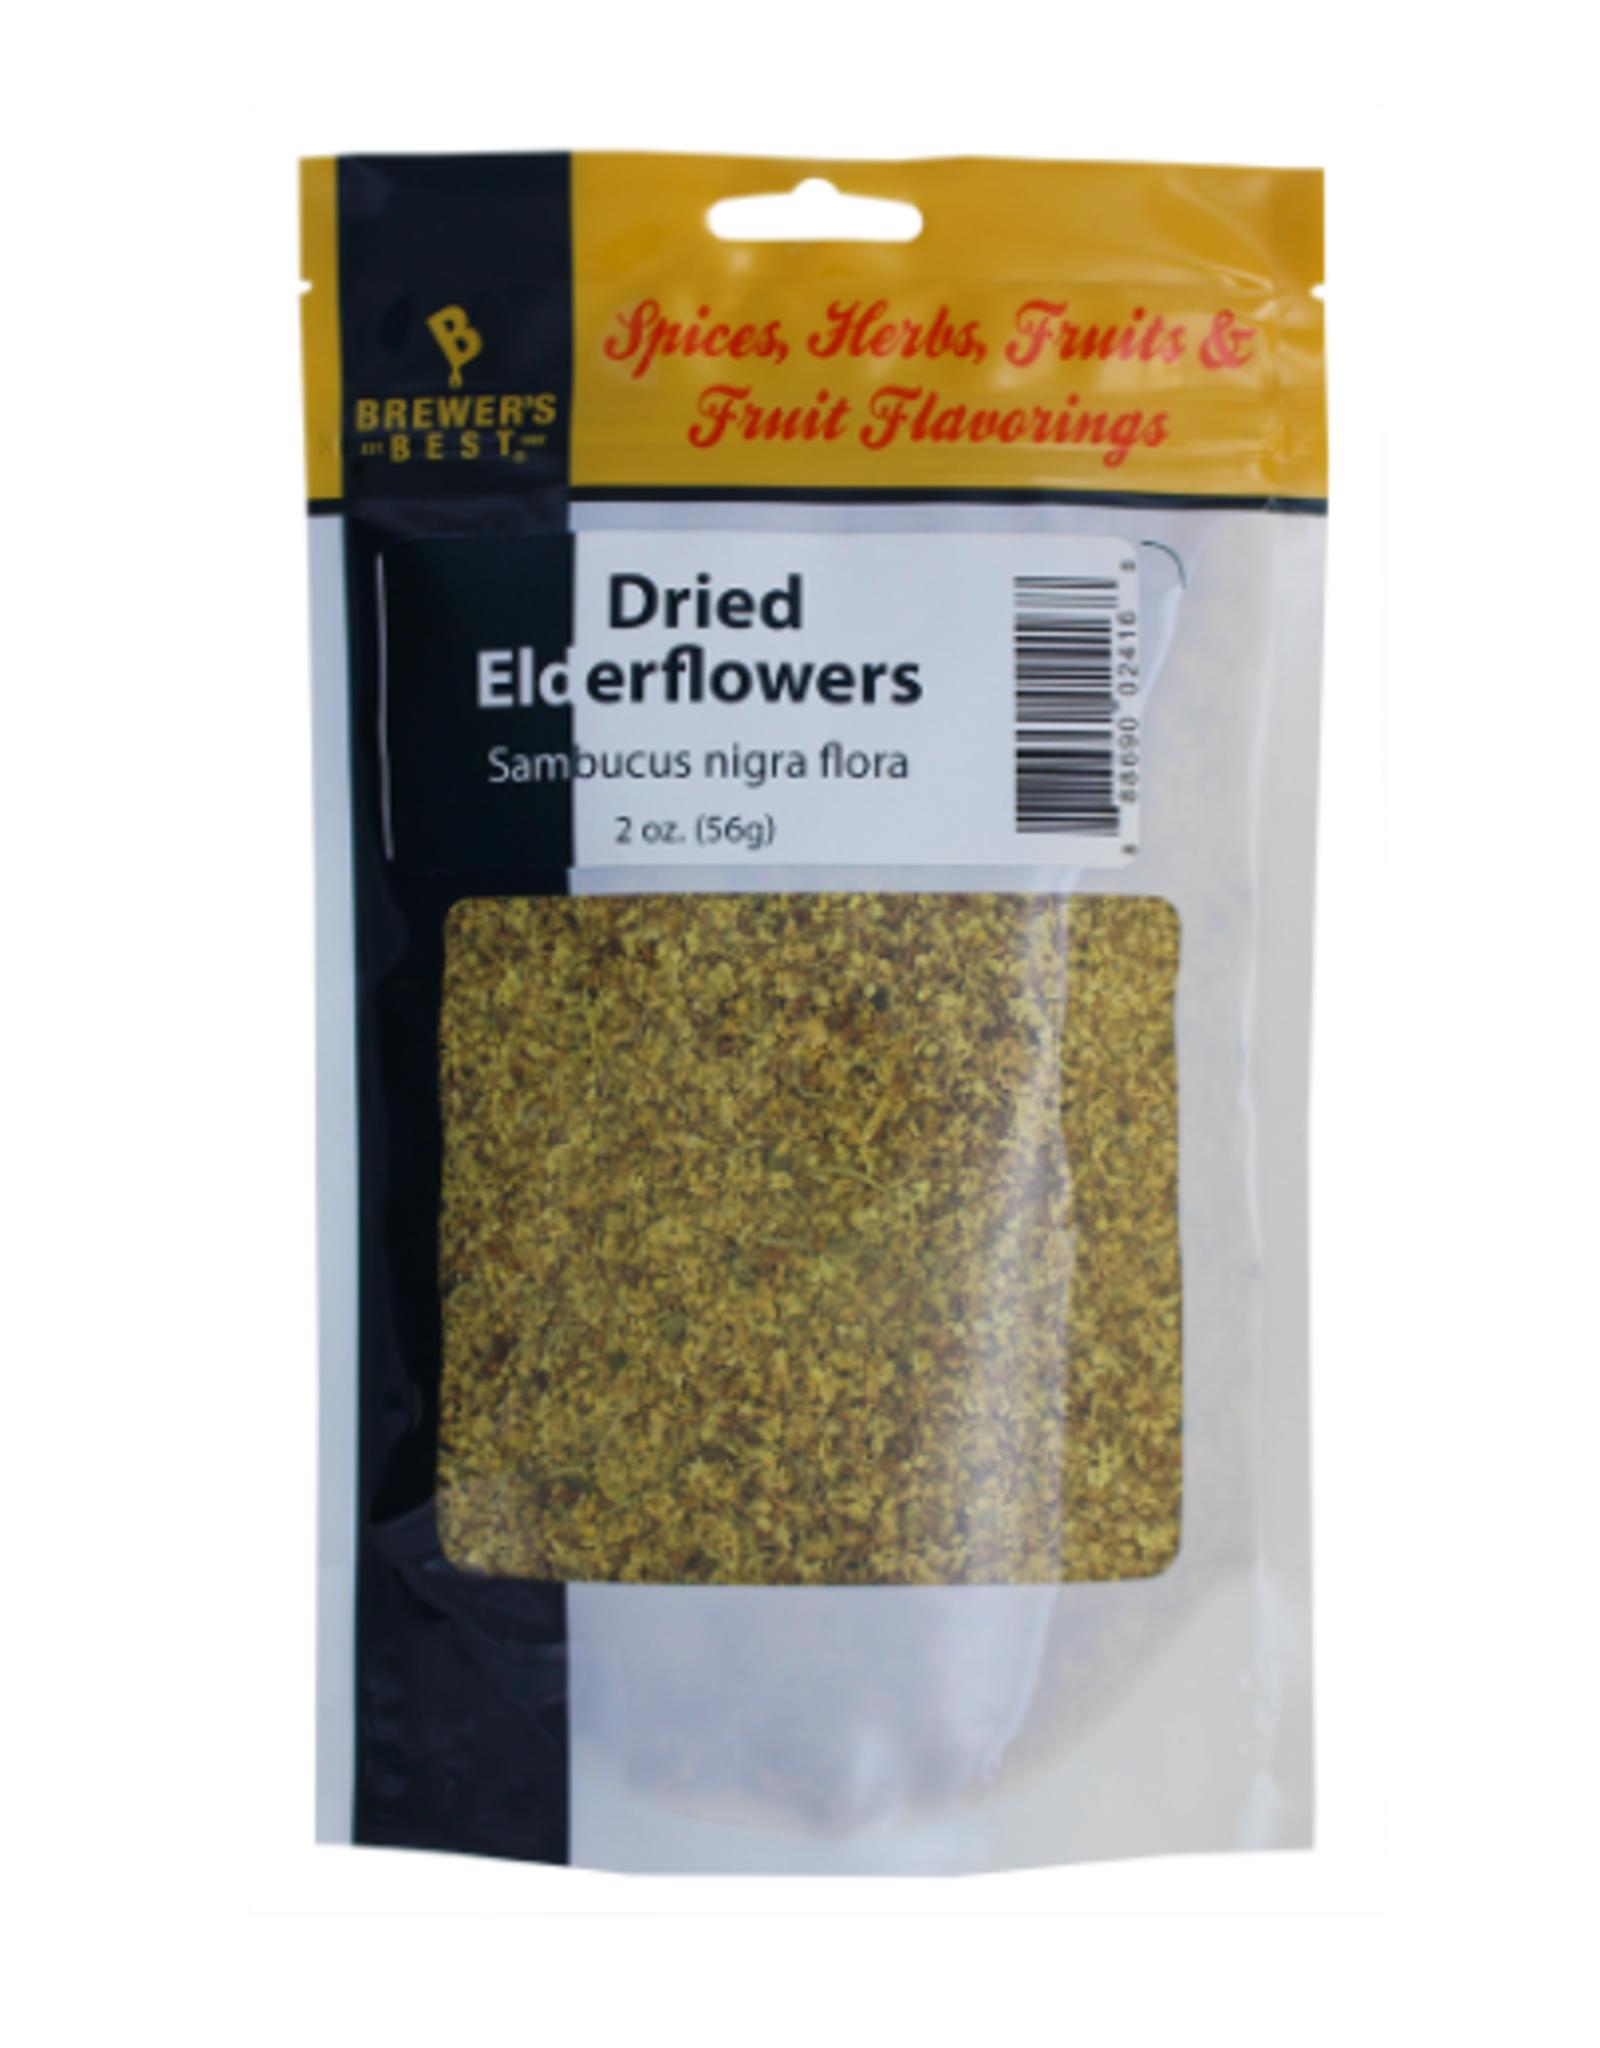 DRIED ELDER- FLOWERS 2 OZ